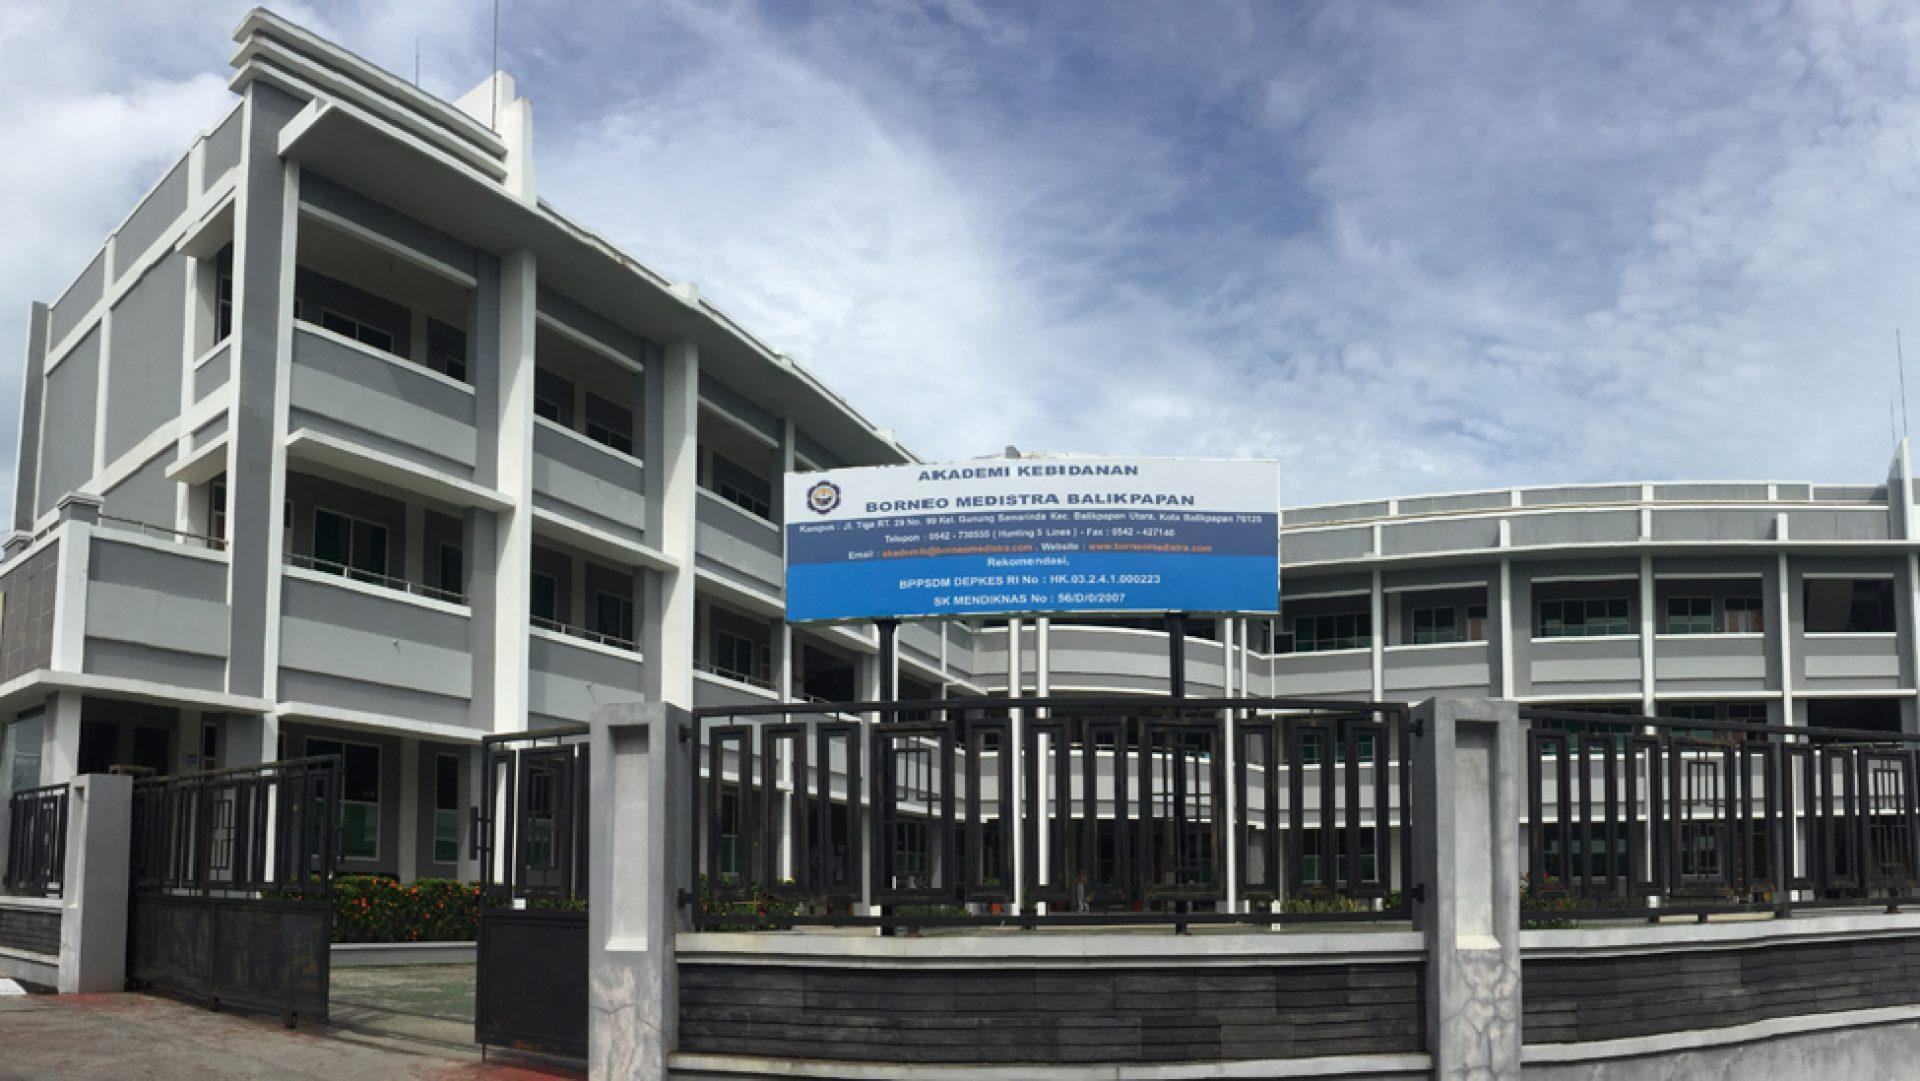 Alumni Akademi Kebidanan Borneo Medistra Balikpapan